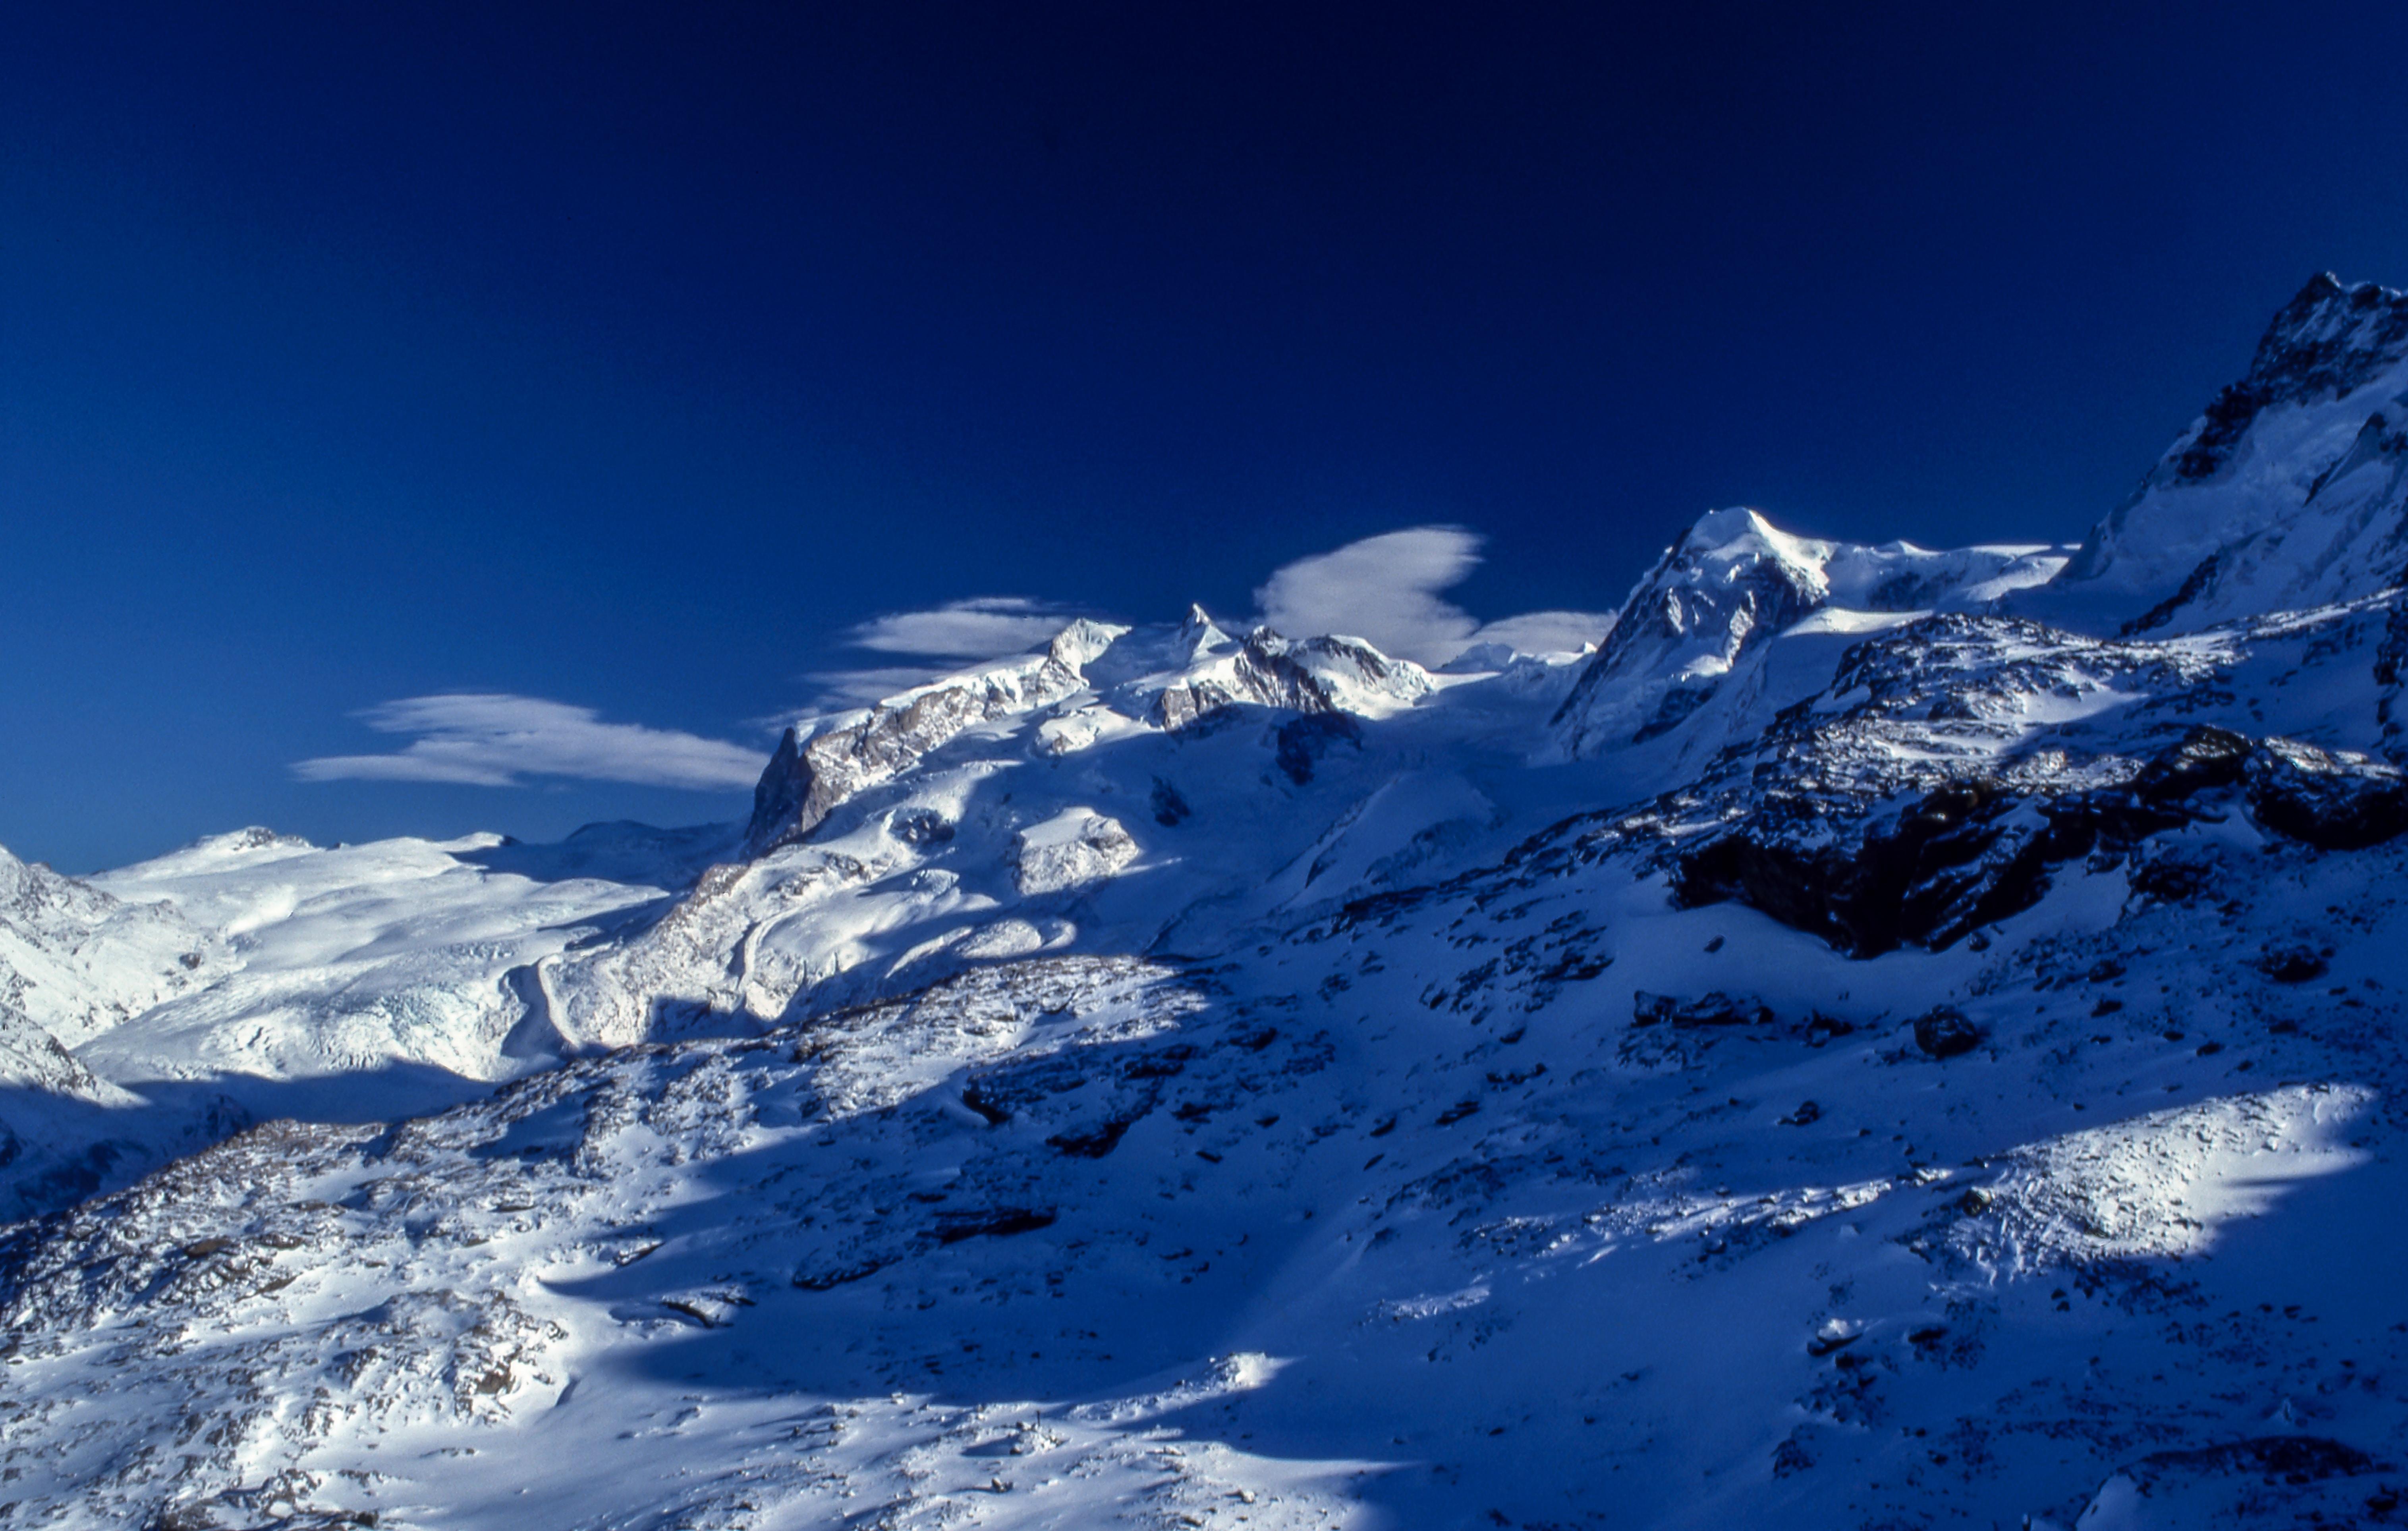 icy mountain photo